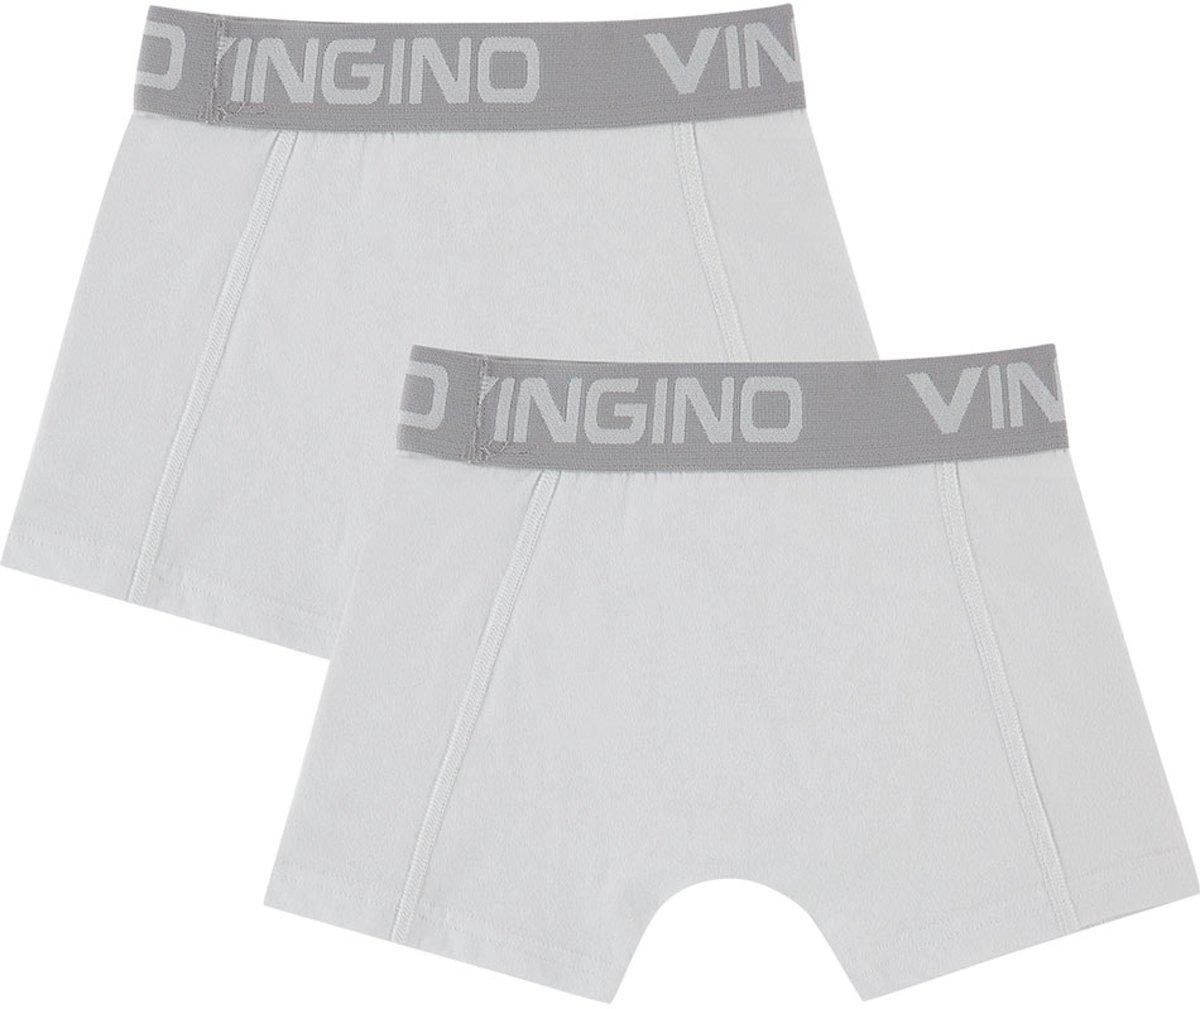 Vingino Jongens Boxershort 2-pack - Real White - Maat 176